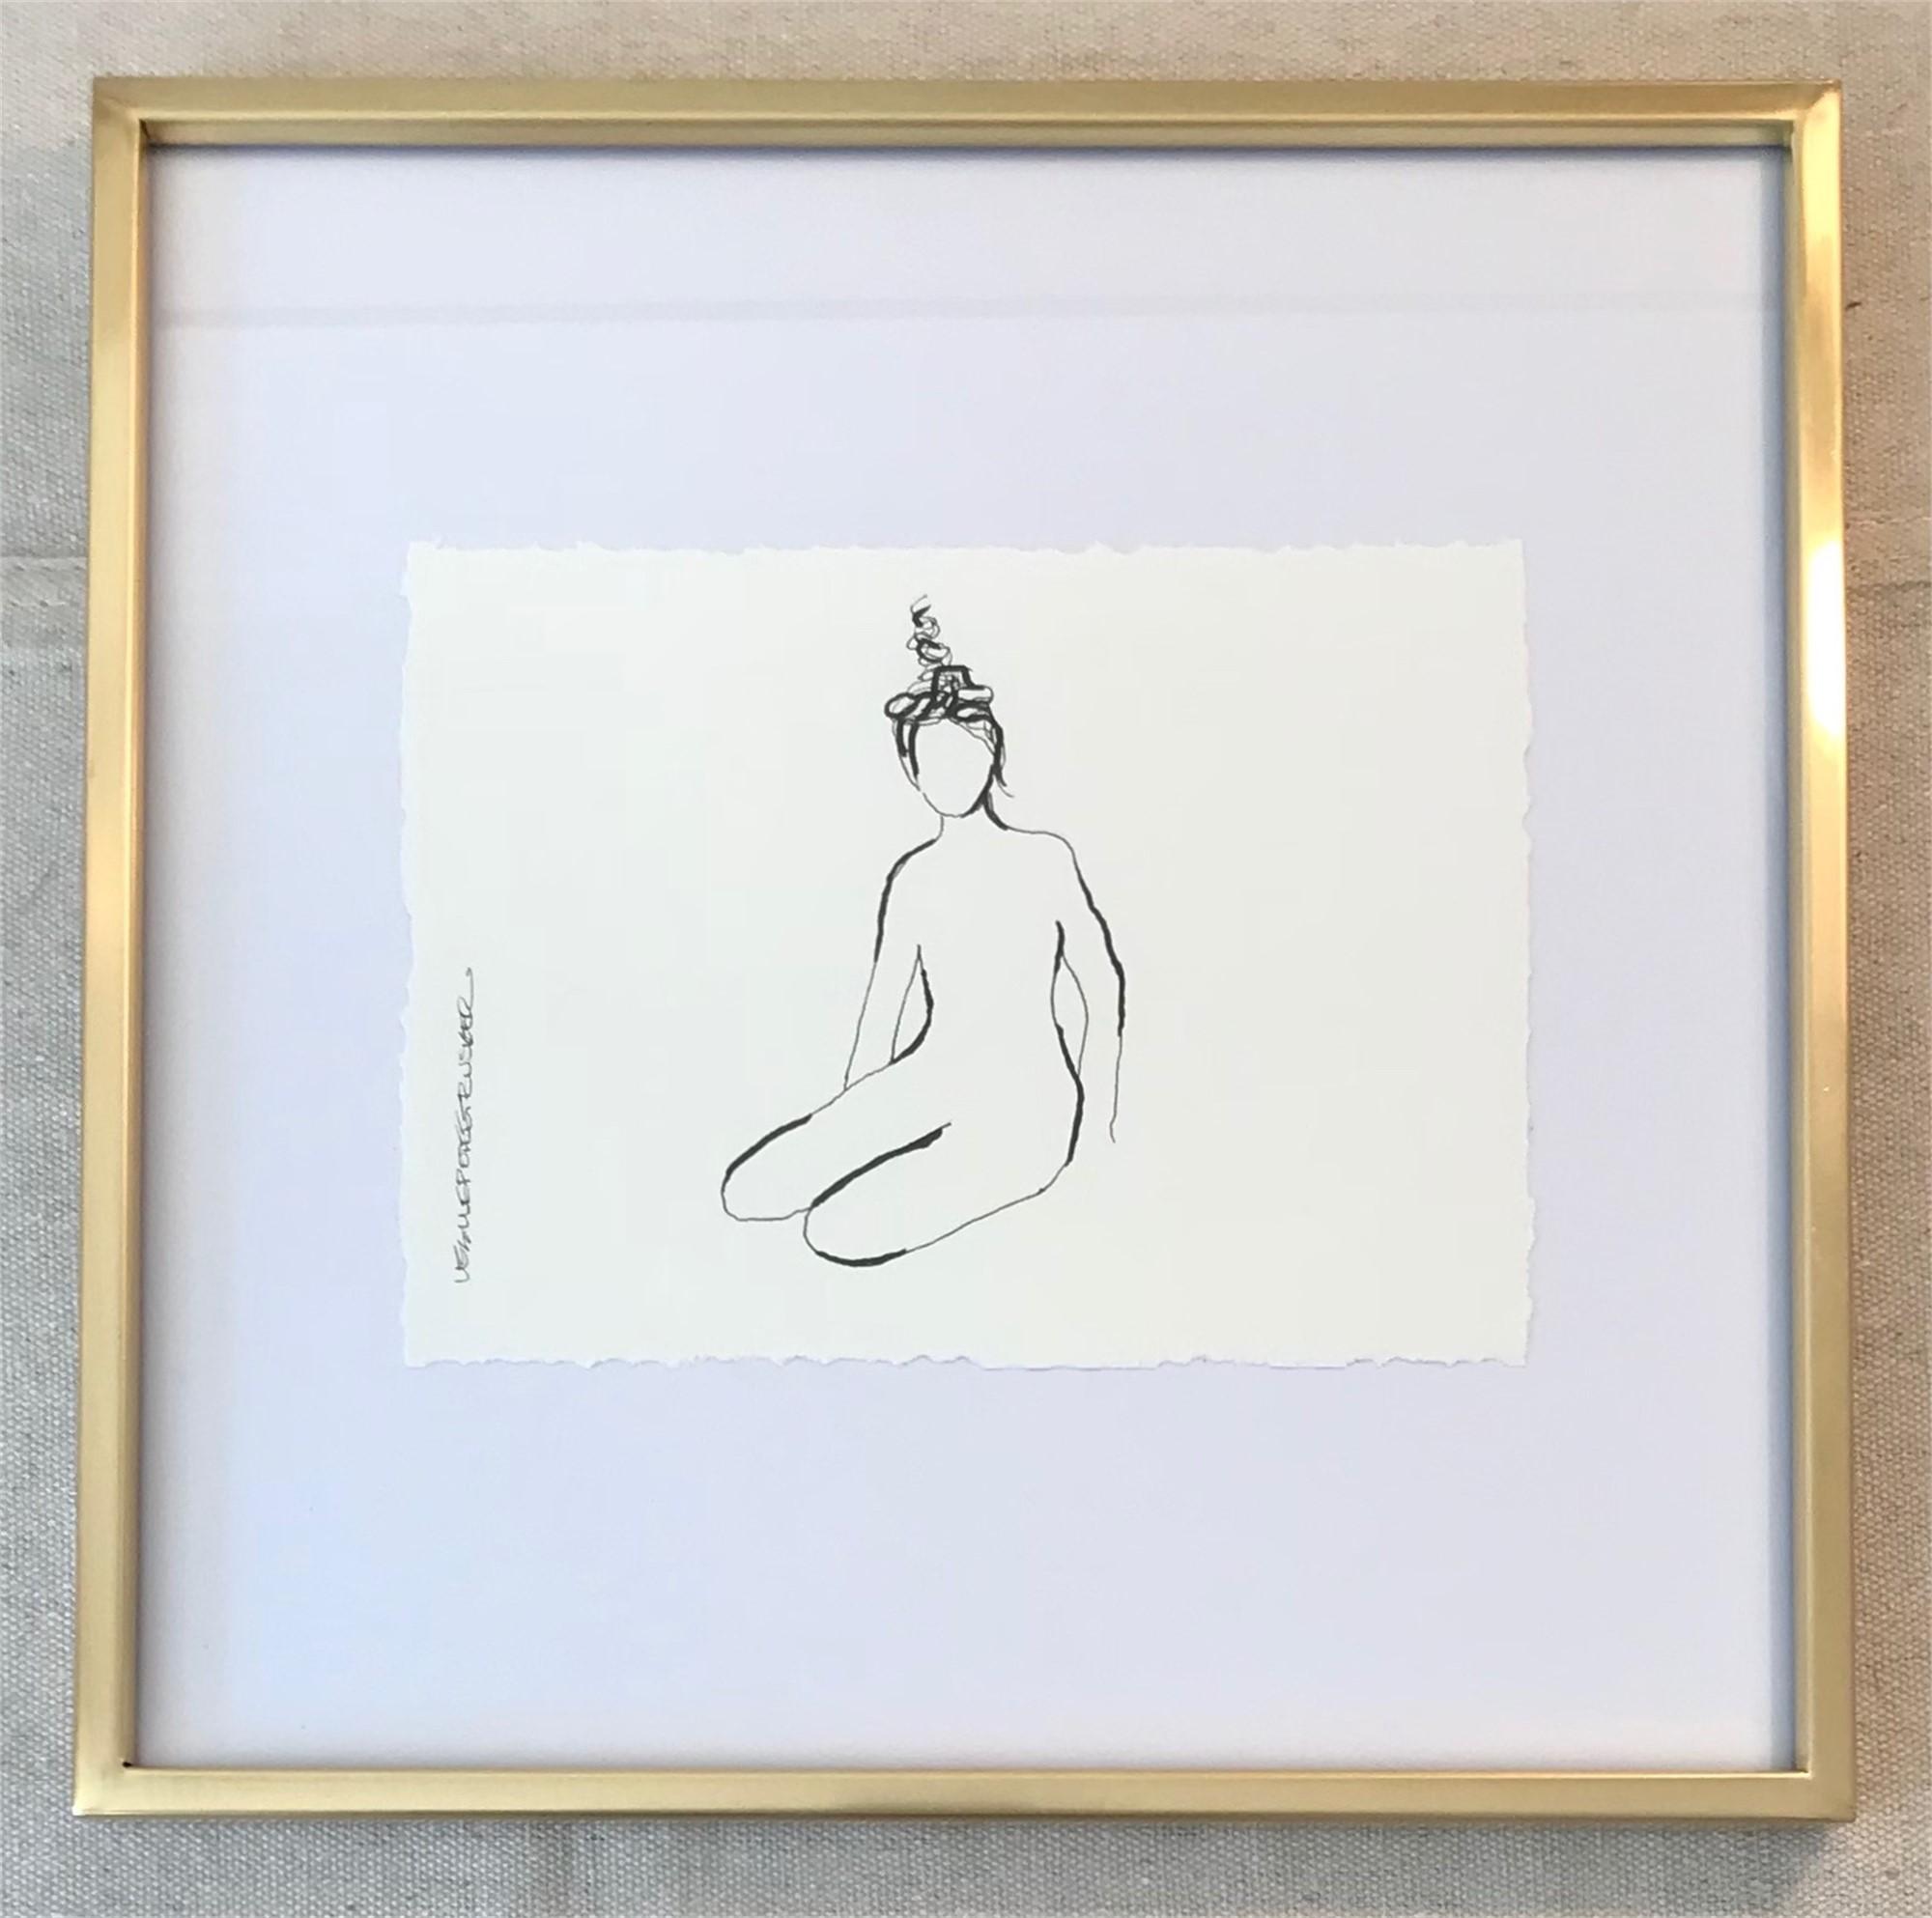 Figure No. 37 by Leslie Poteet Busker